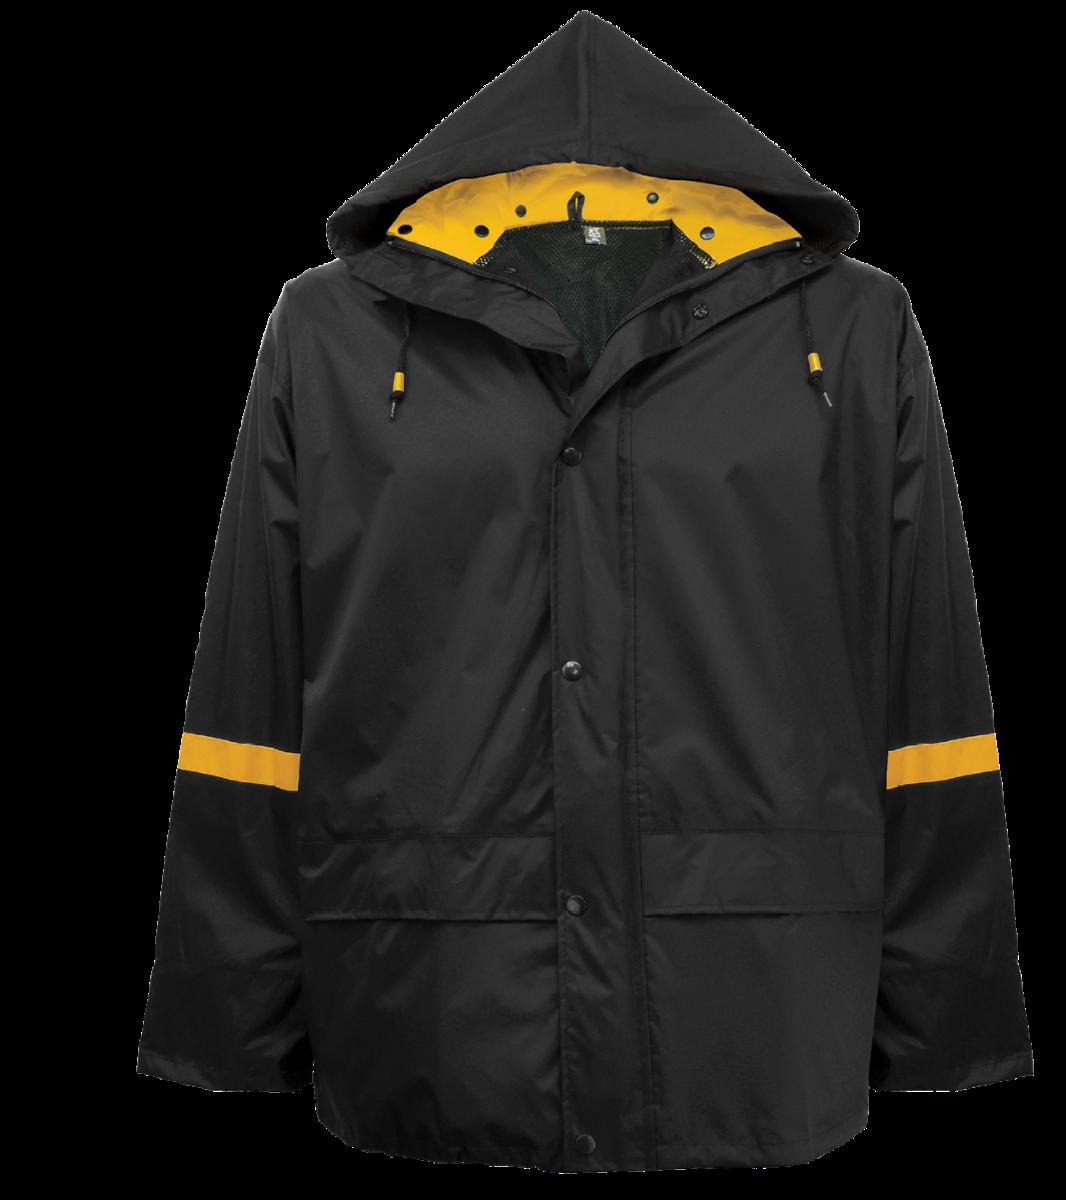 R6400 - FrogWear - 3-Piece Premium Nylon Rain Jacket